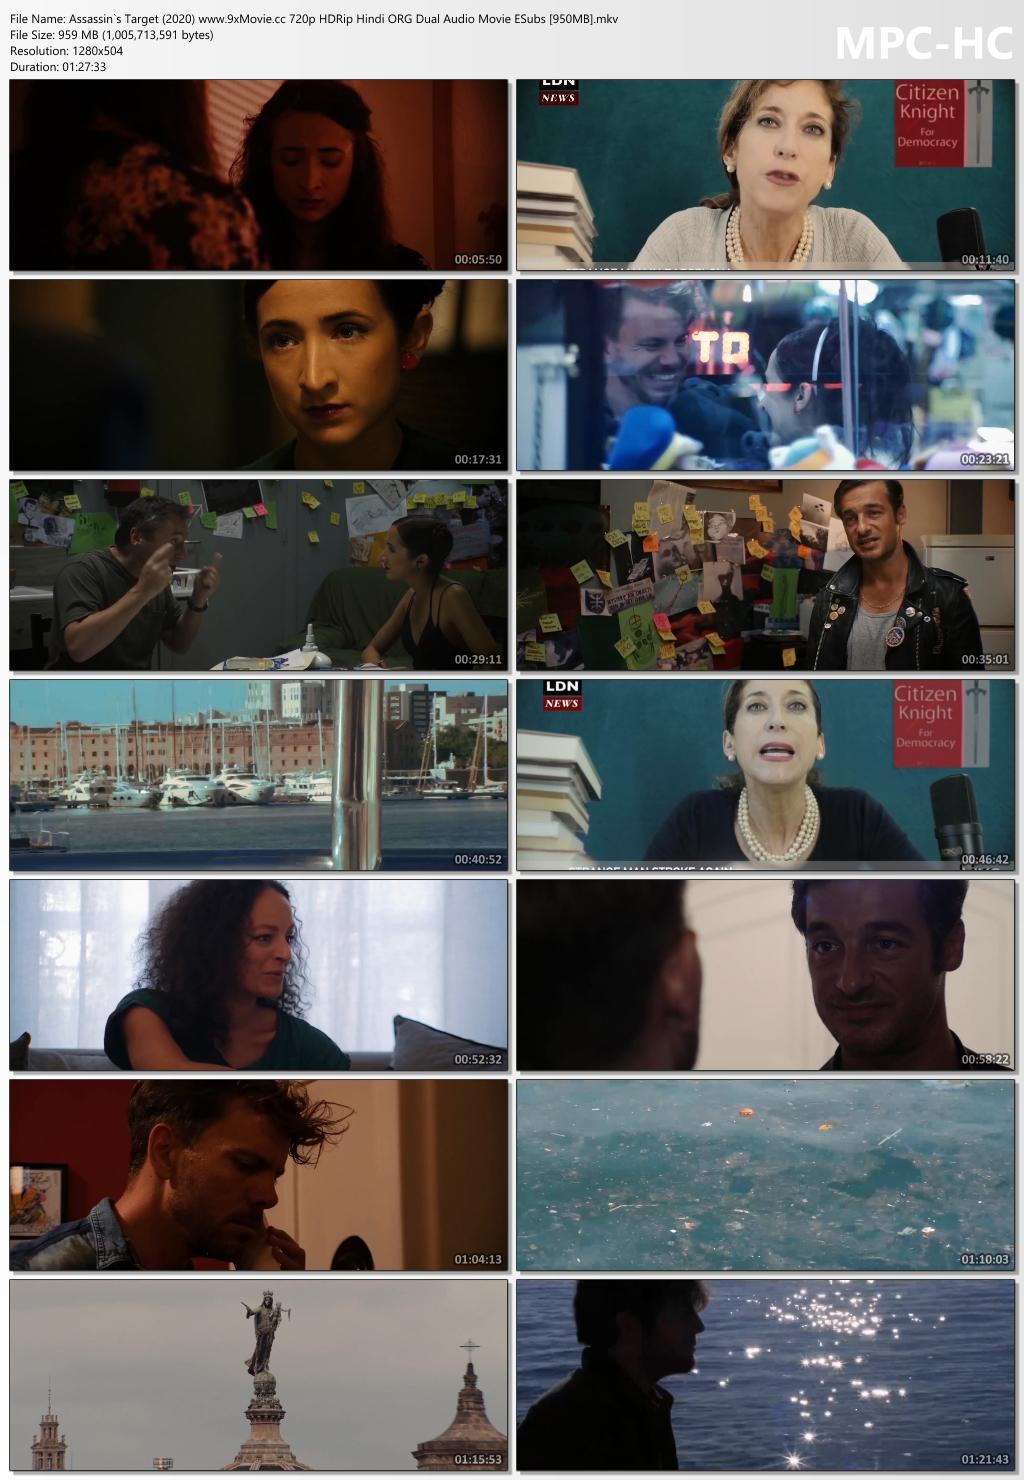 Assassin-s-Target-2020-www-9x-Movie-cc-720p-HDRip-Hindi-ORG-Dual-Audio-Movie-ESubs-950-MB-mkv